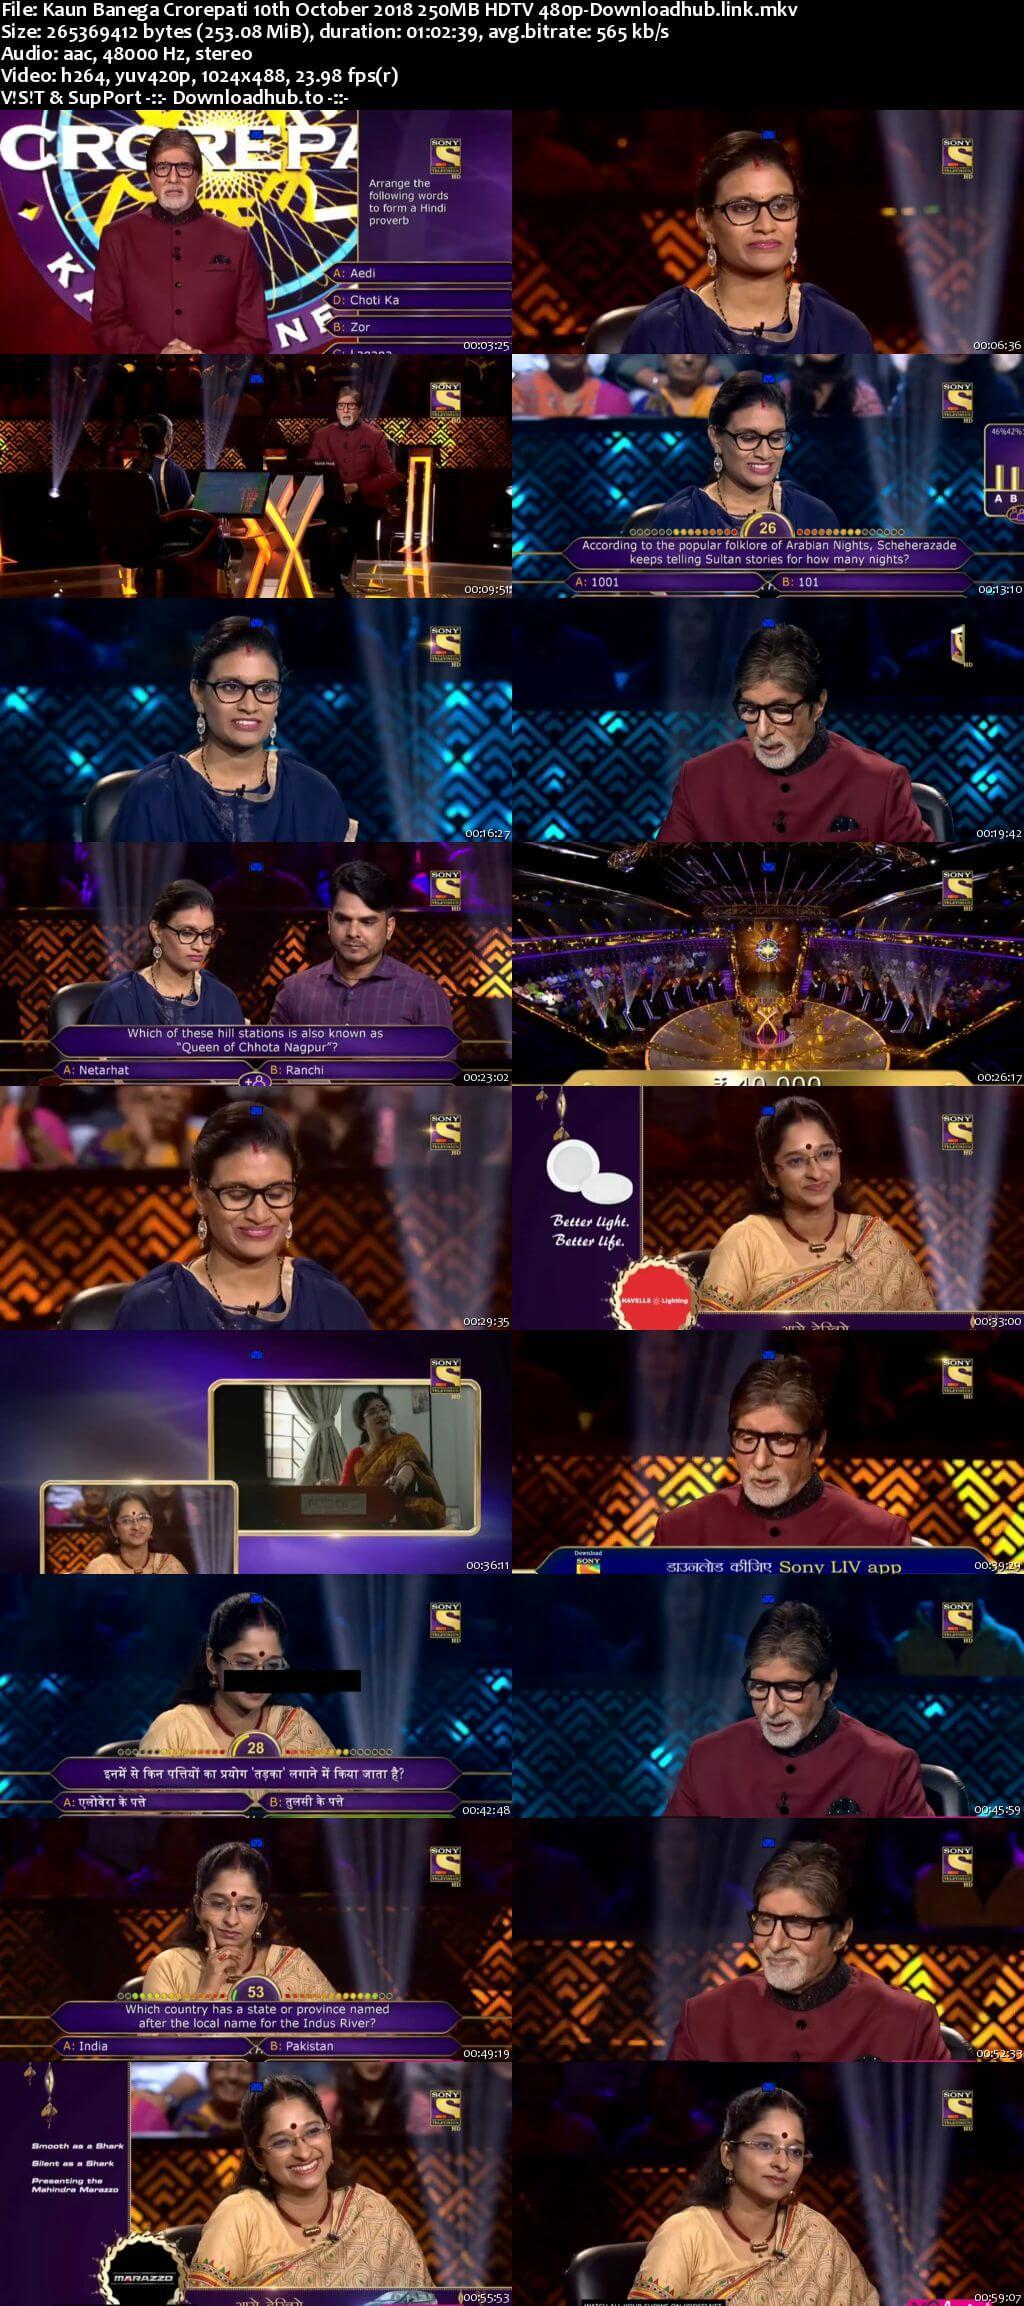 Kaun Banega Crorepati 10th October 2018 250MB HDTV 480p